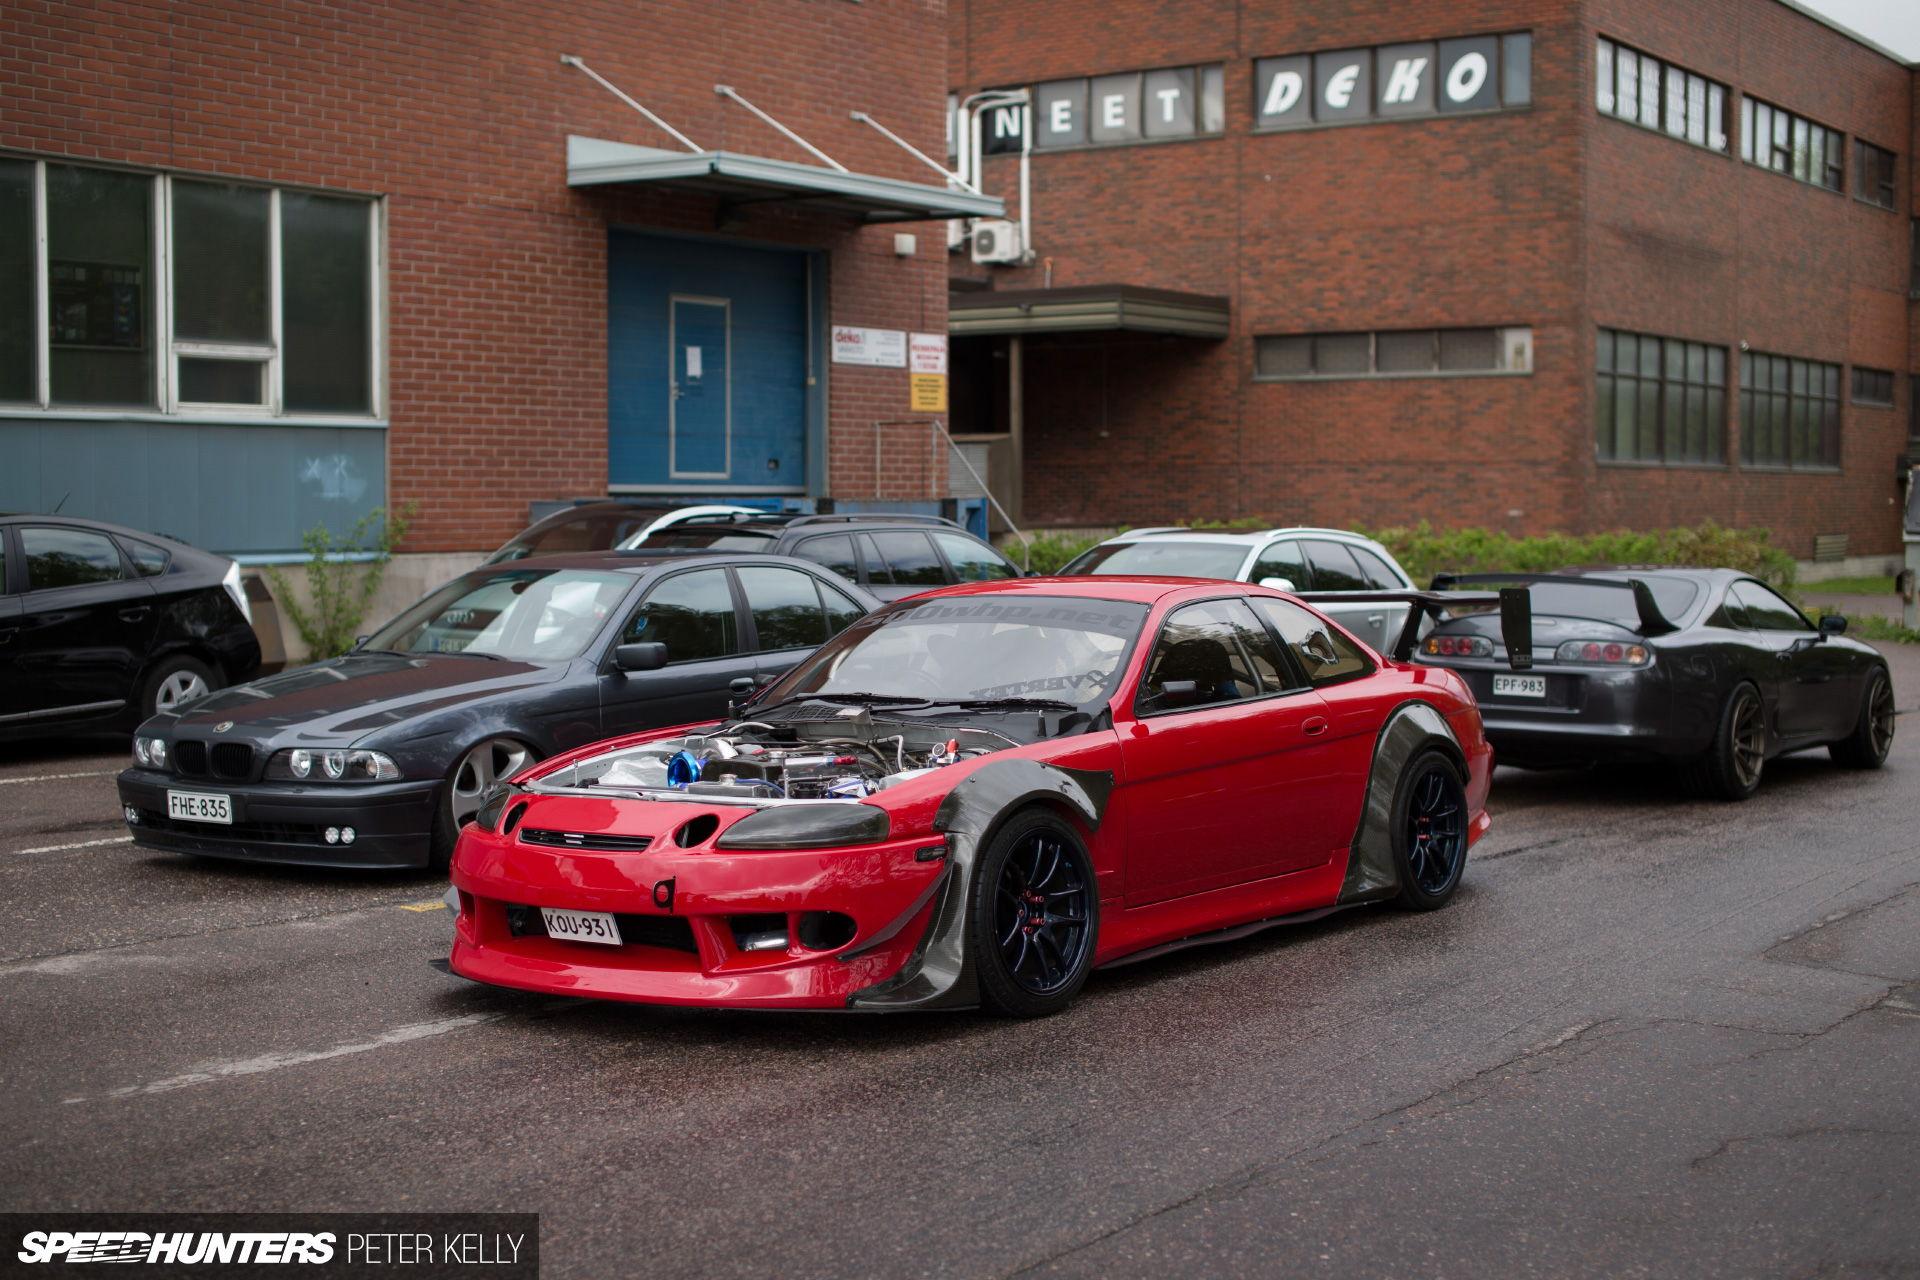 ... to date IMHO. SH Pic inside! - ClubLexus - Lexus Enthusiast Forums Lexus Enthusiast